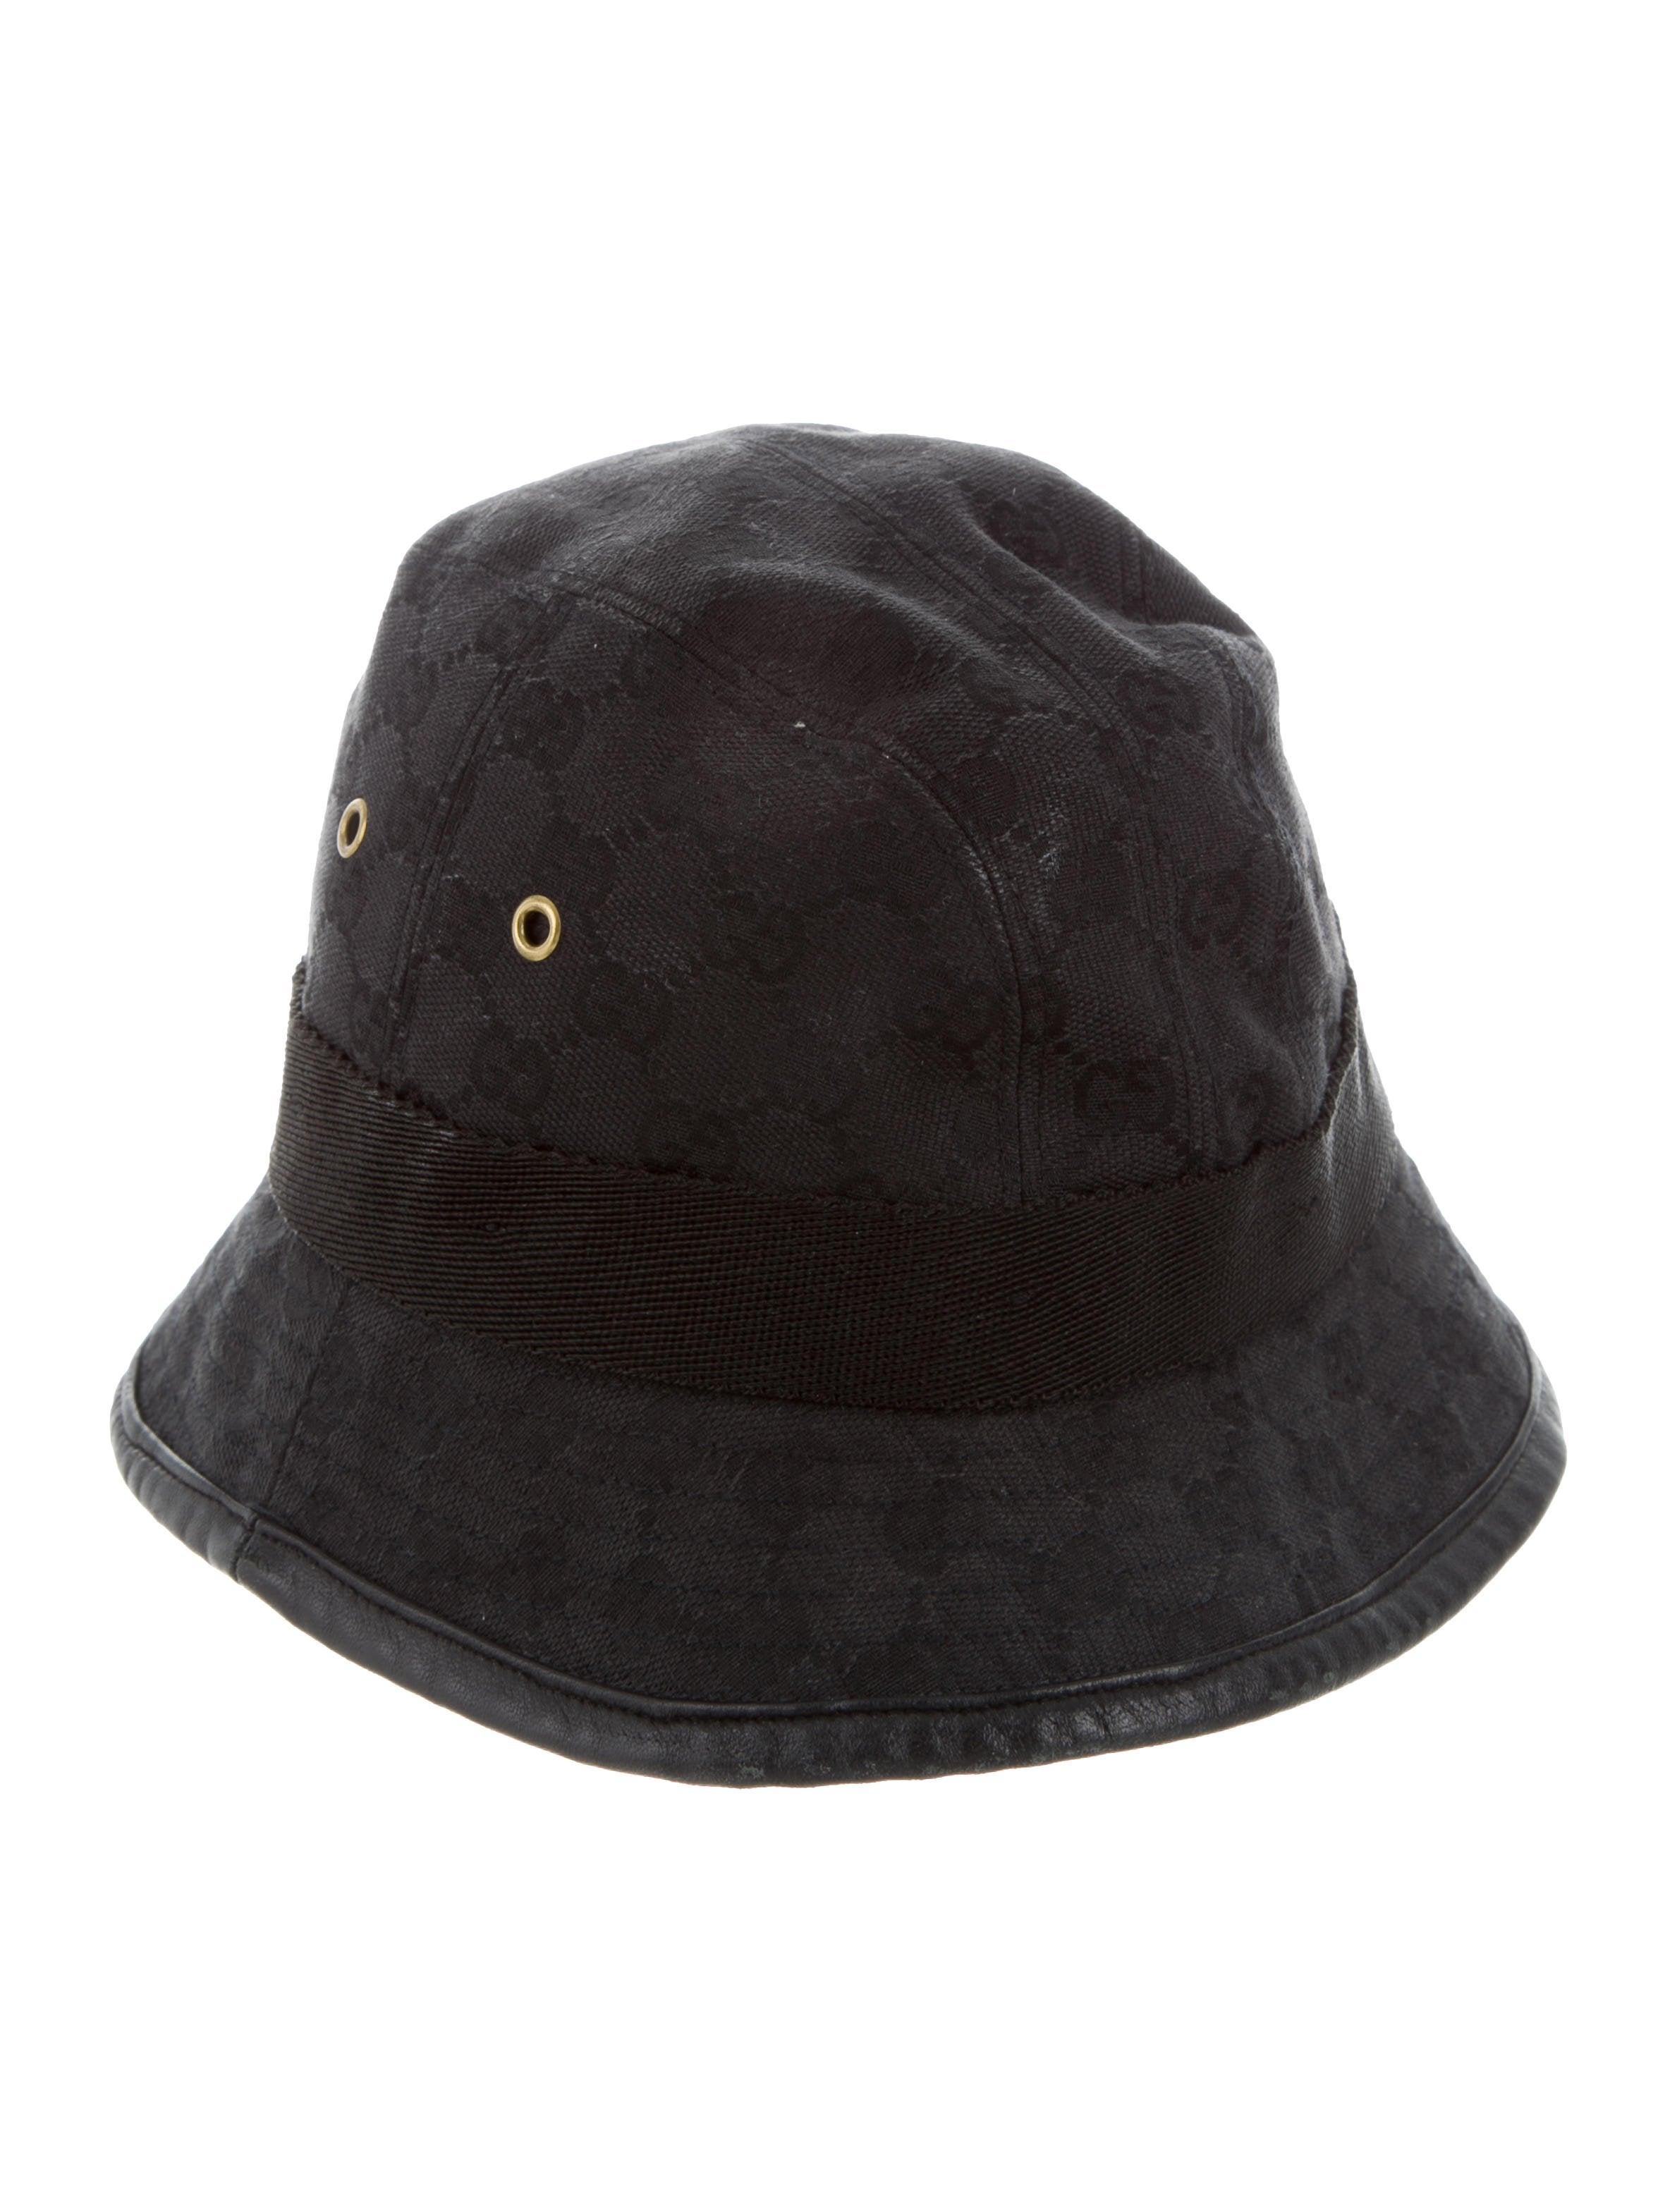 Gucci GG Supreme Bucket Hat - Accessories - GUC174770  cd3debfab18